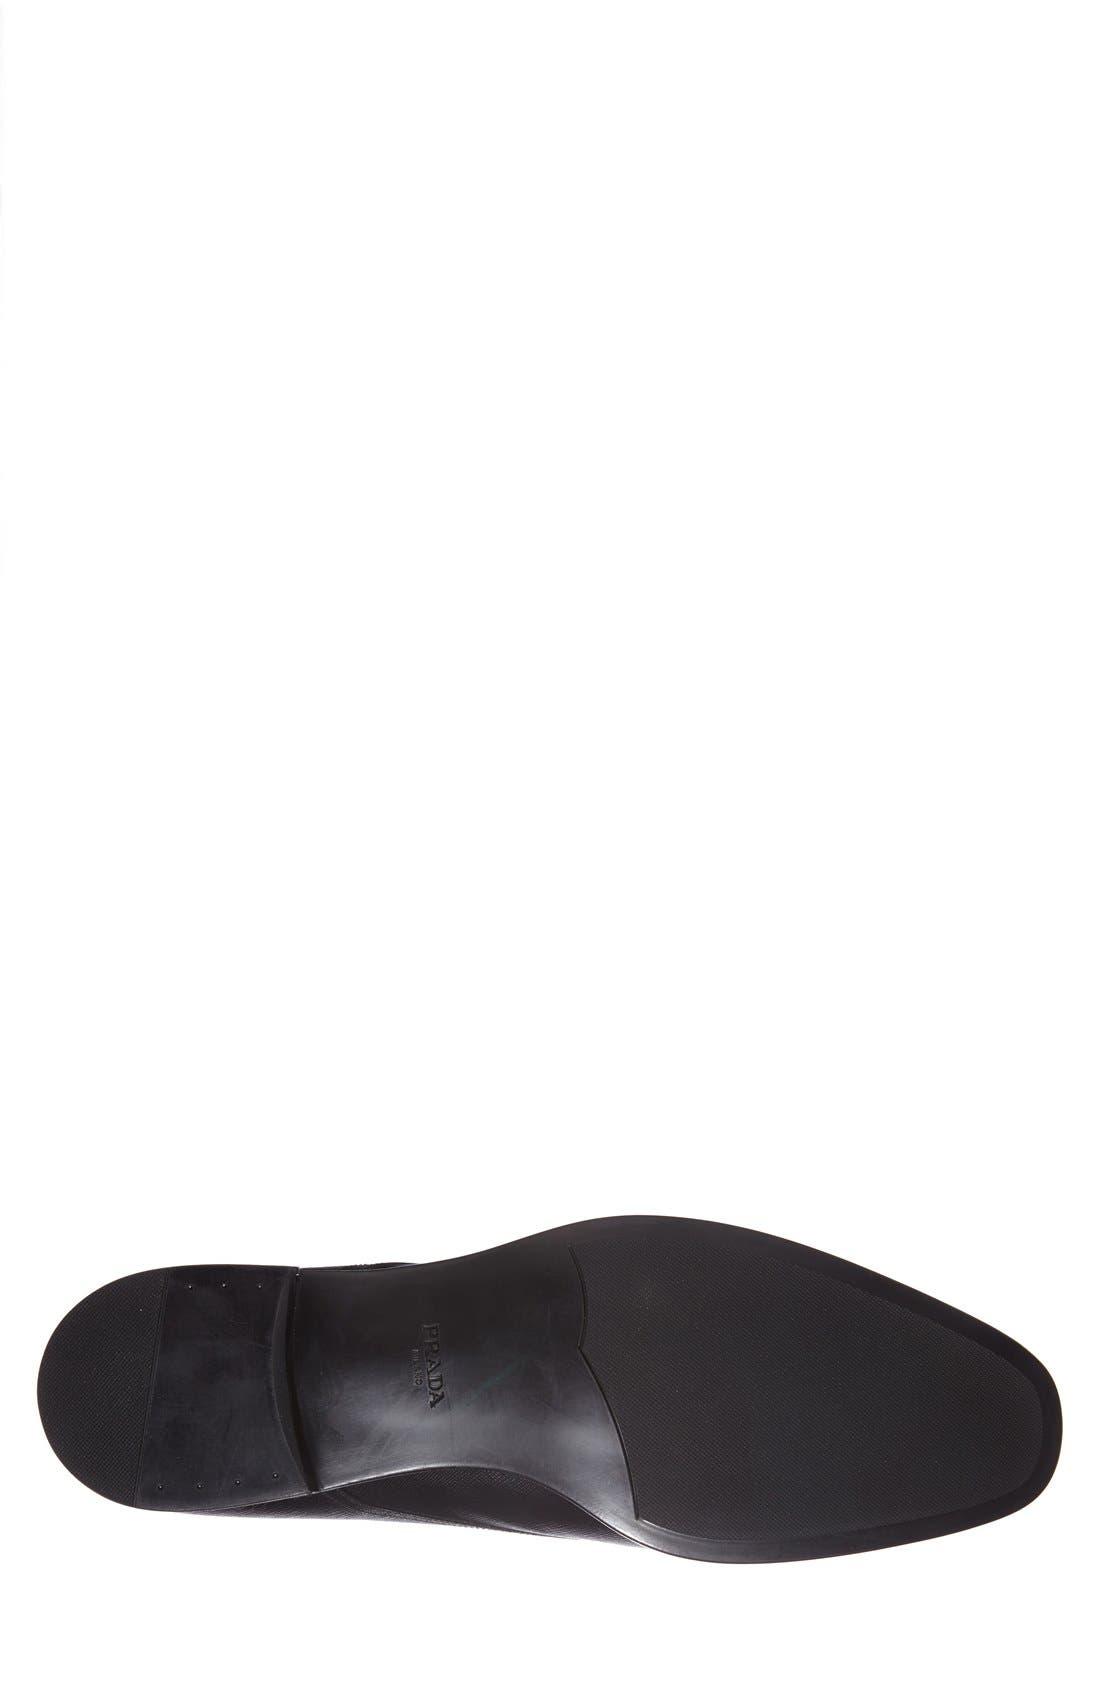 PRADA, Plain Toe Derby, Alternate thumbnail 2, color, BLACK